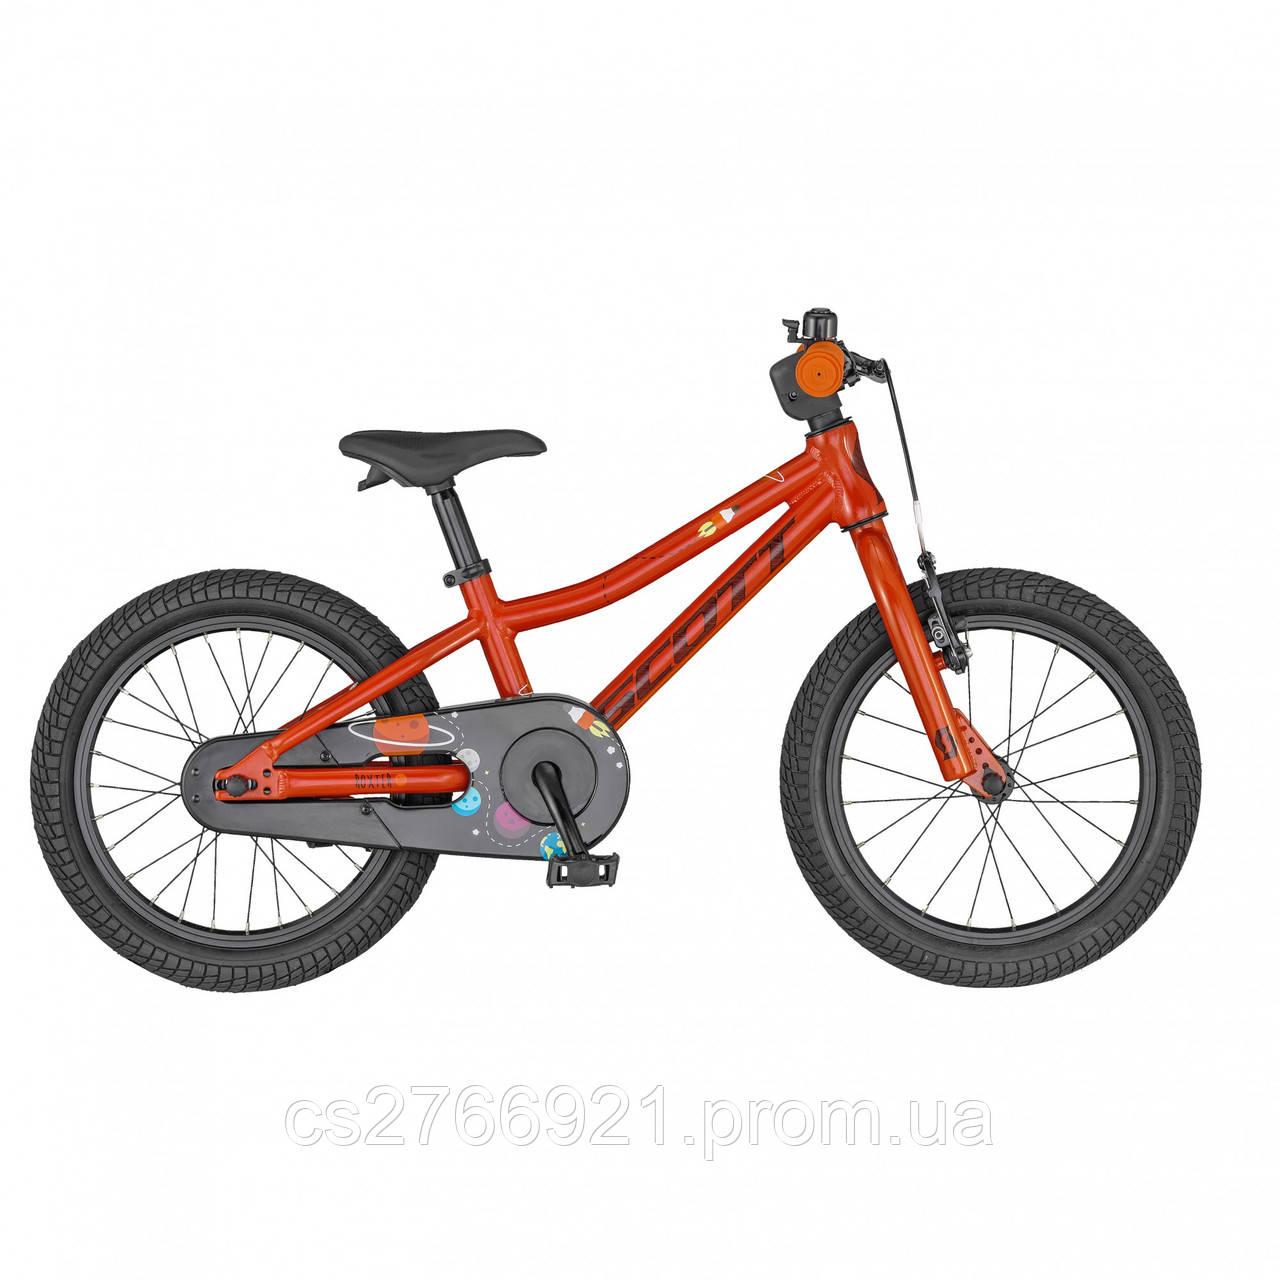 Велосипед ROXTER 16 (CN) 20 SCOTT